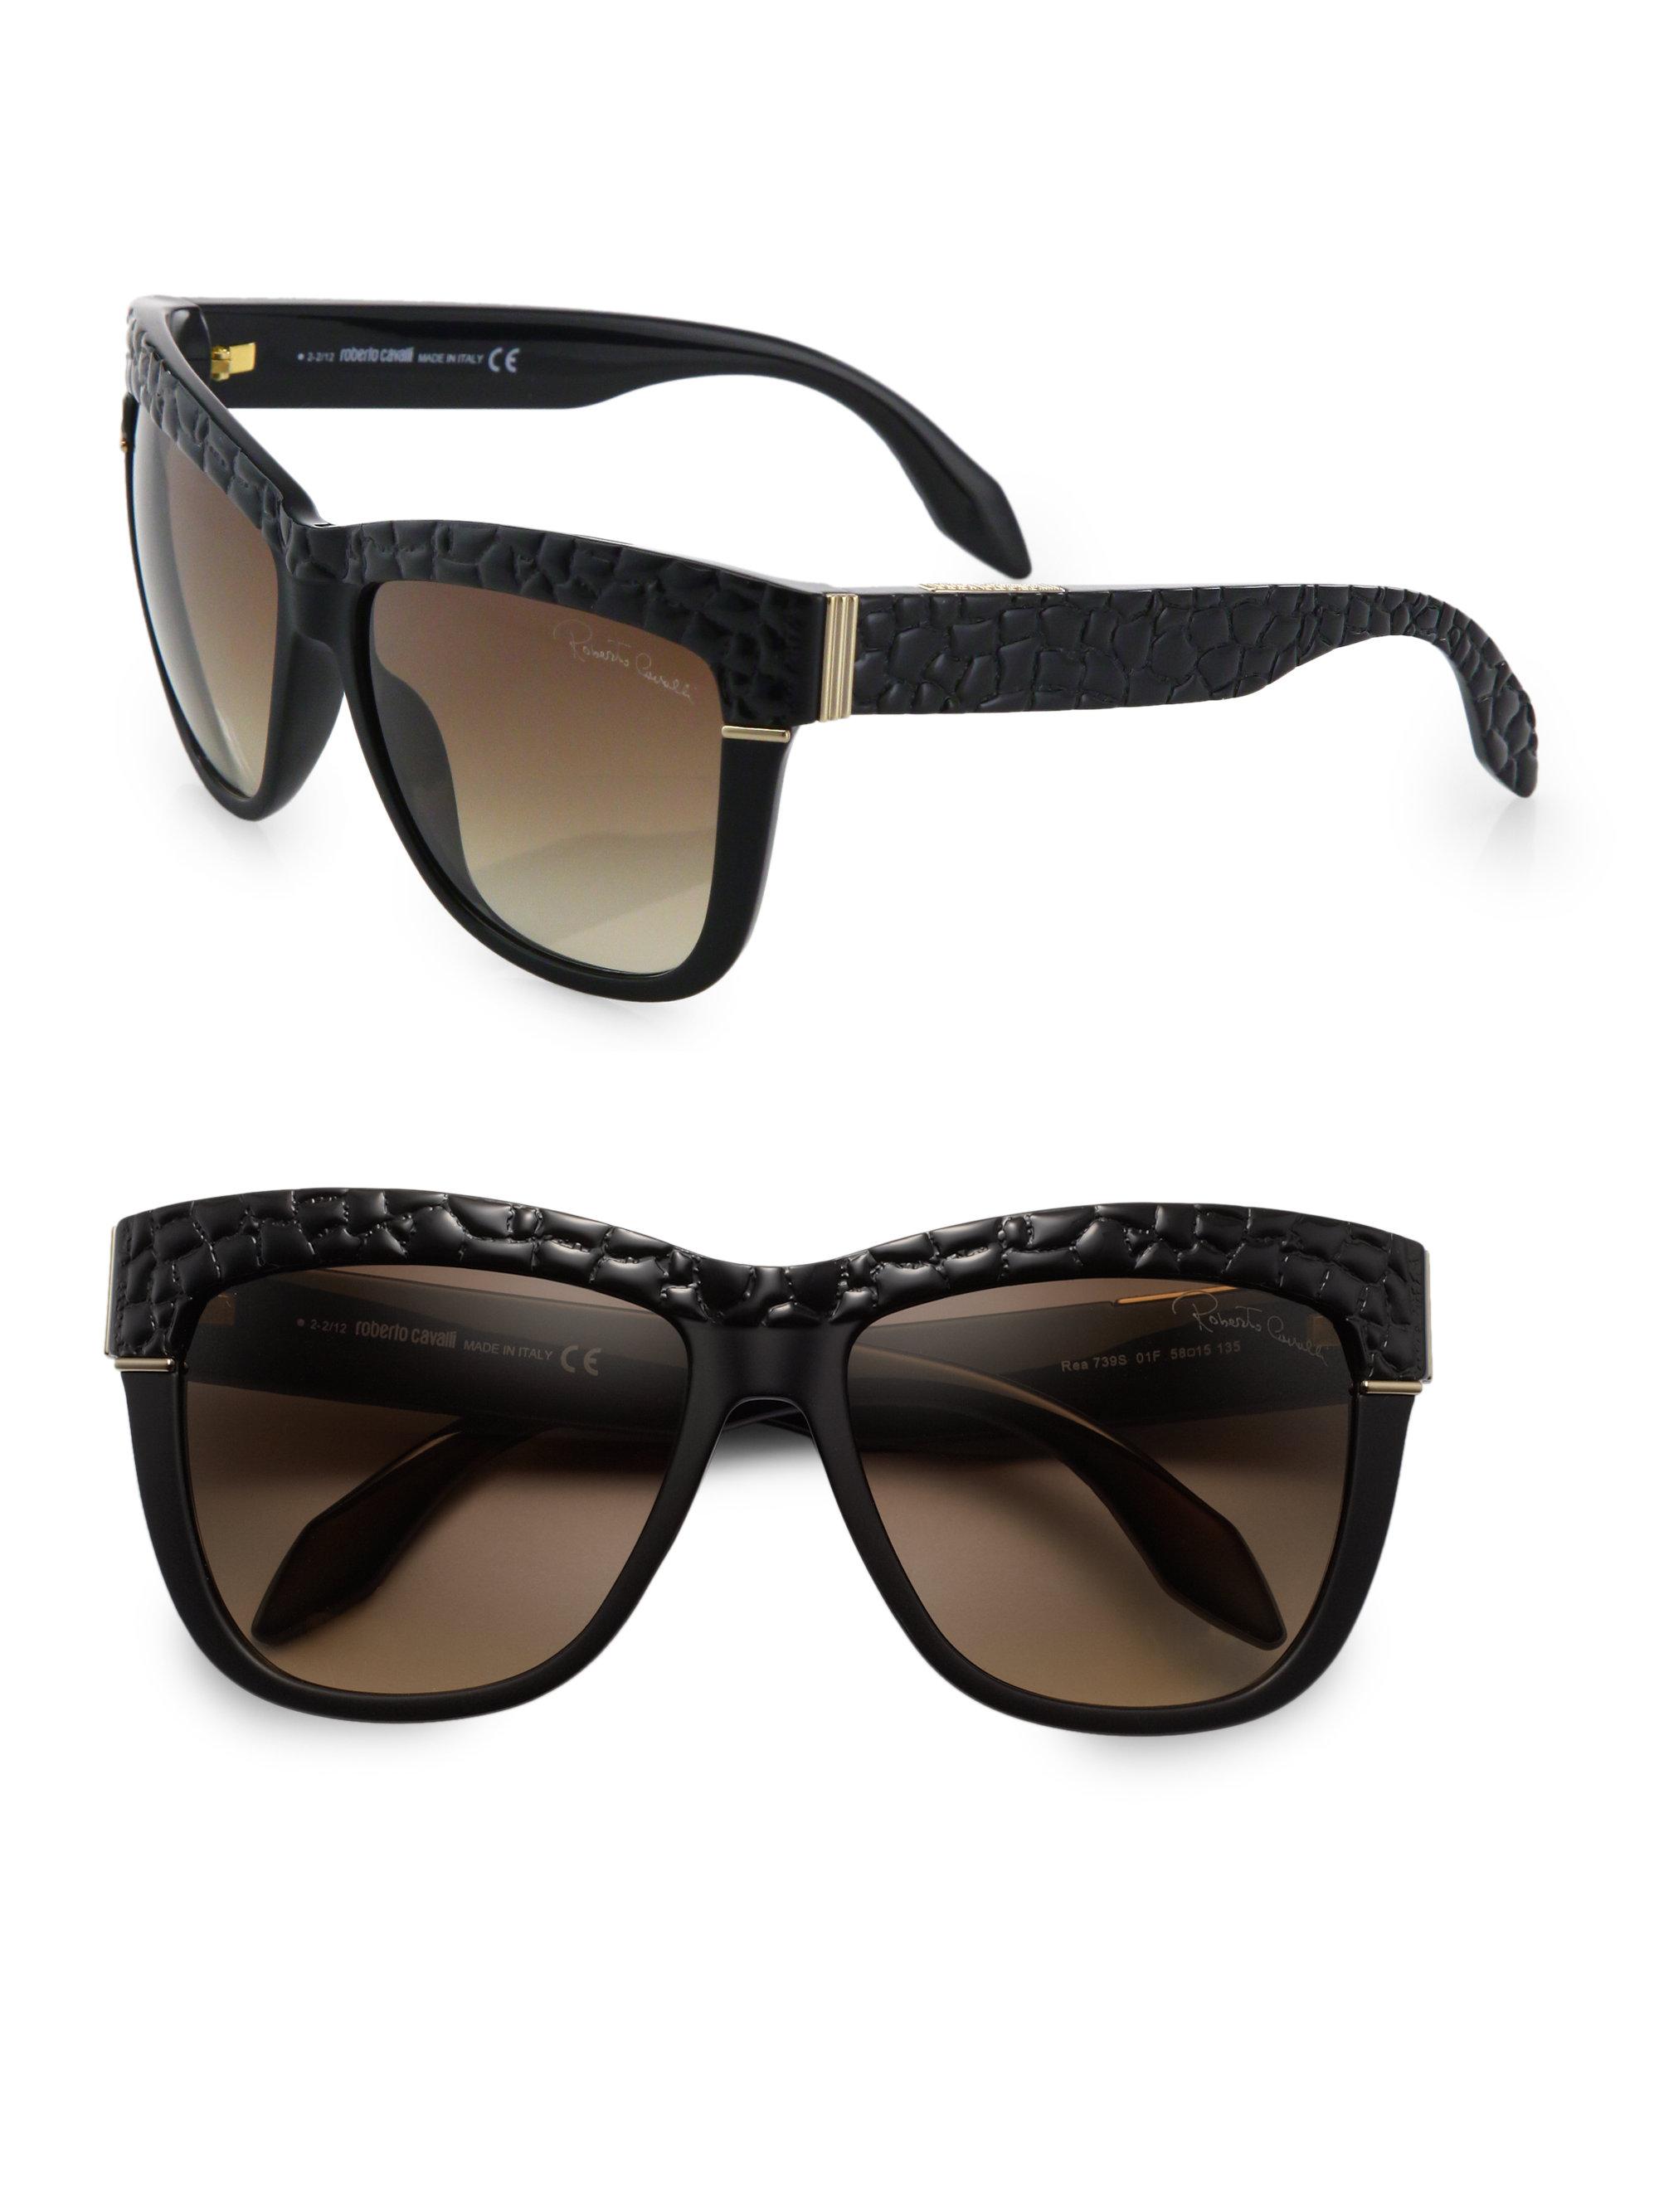 d59d215eb14 Roberto Cavalli Snake Embossed Square Sunglasses in Black - Lyst